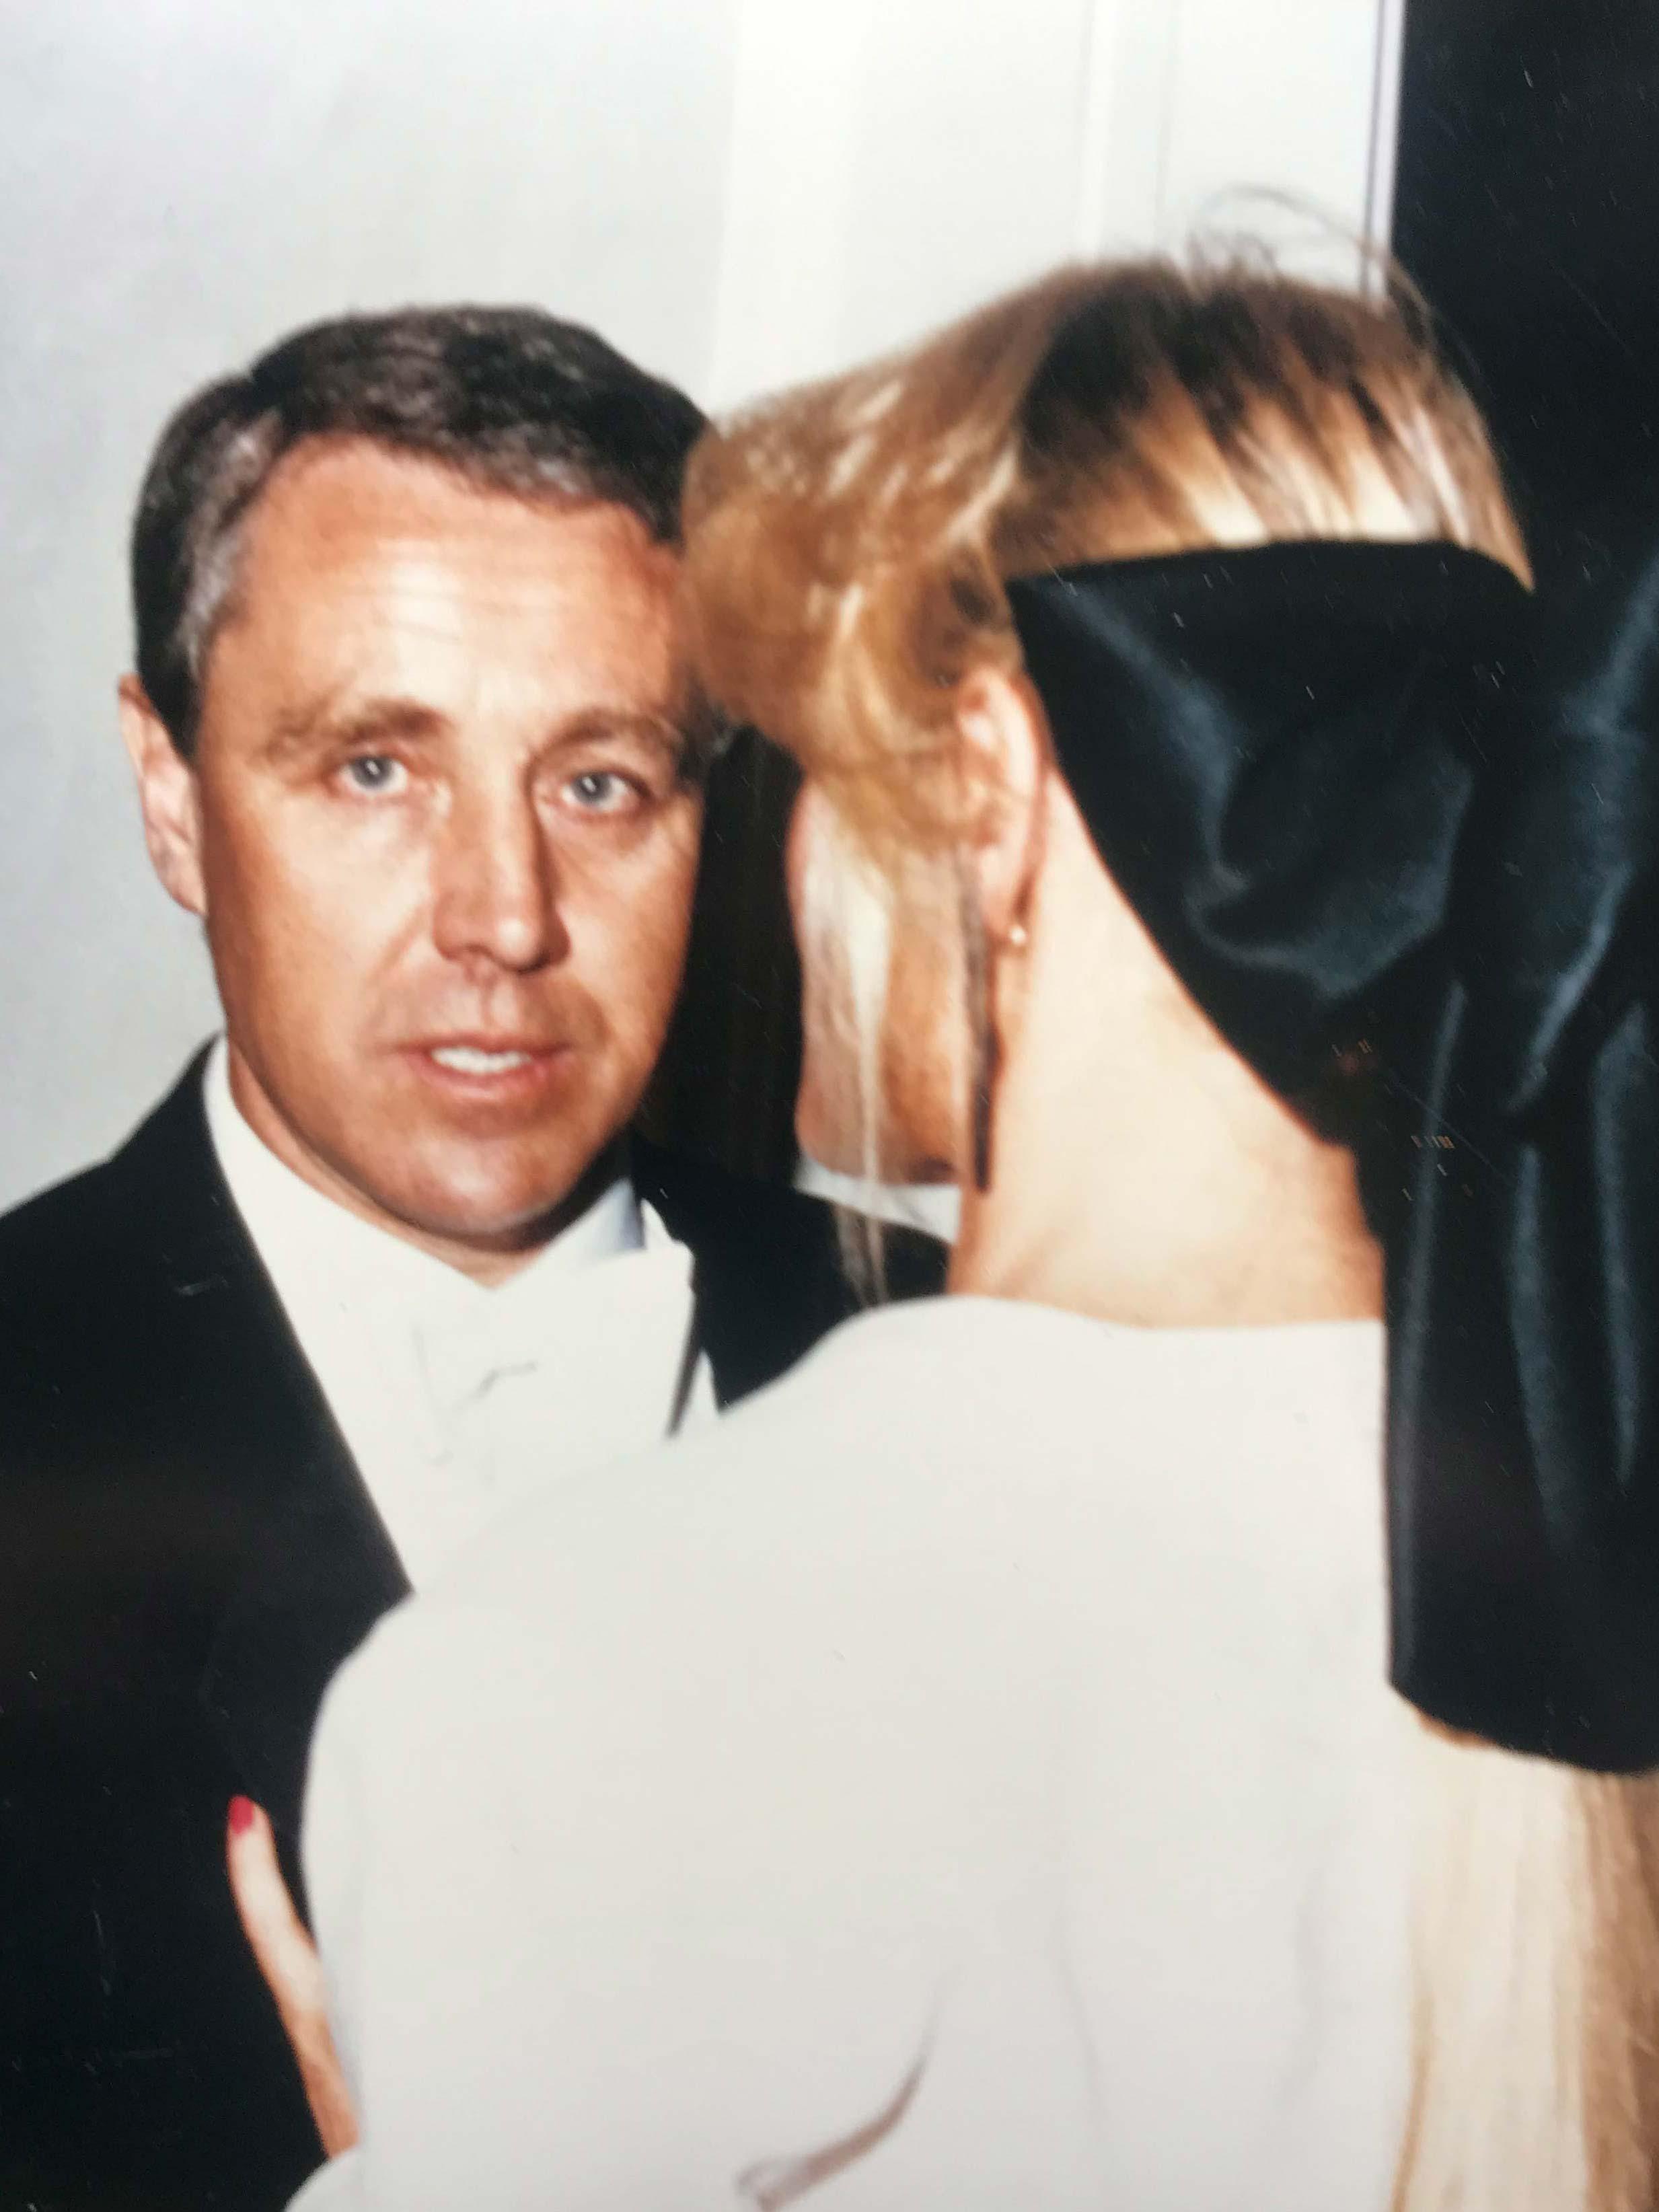 Peter Rowland Black Tie